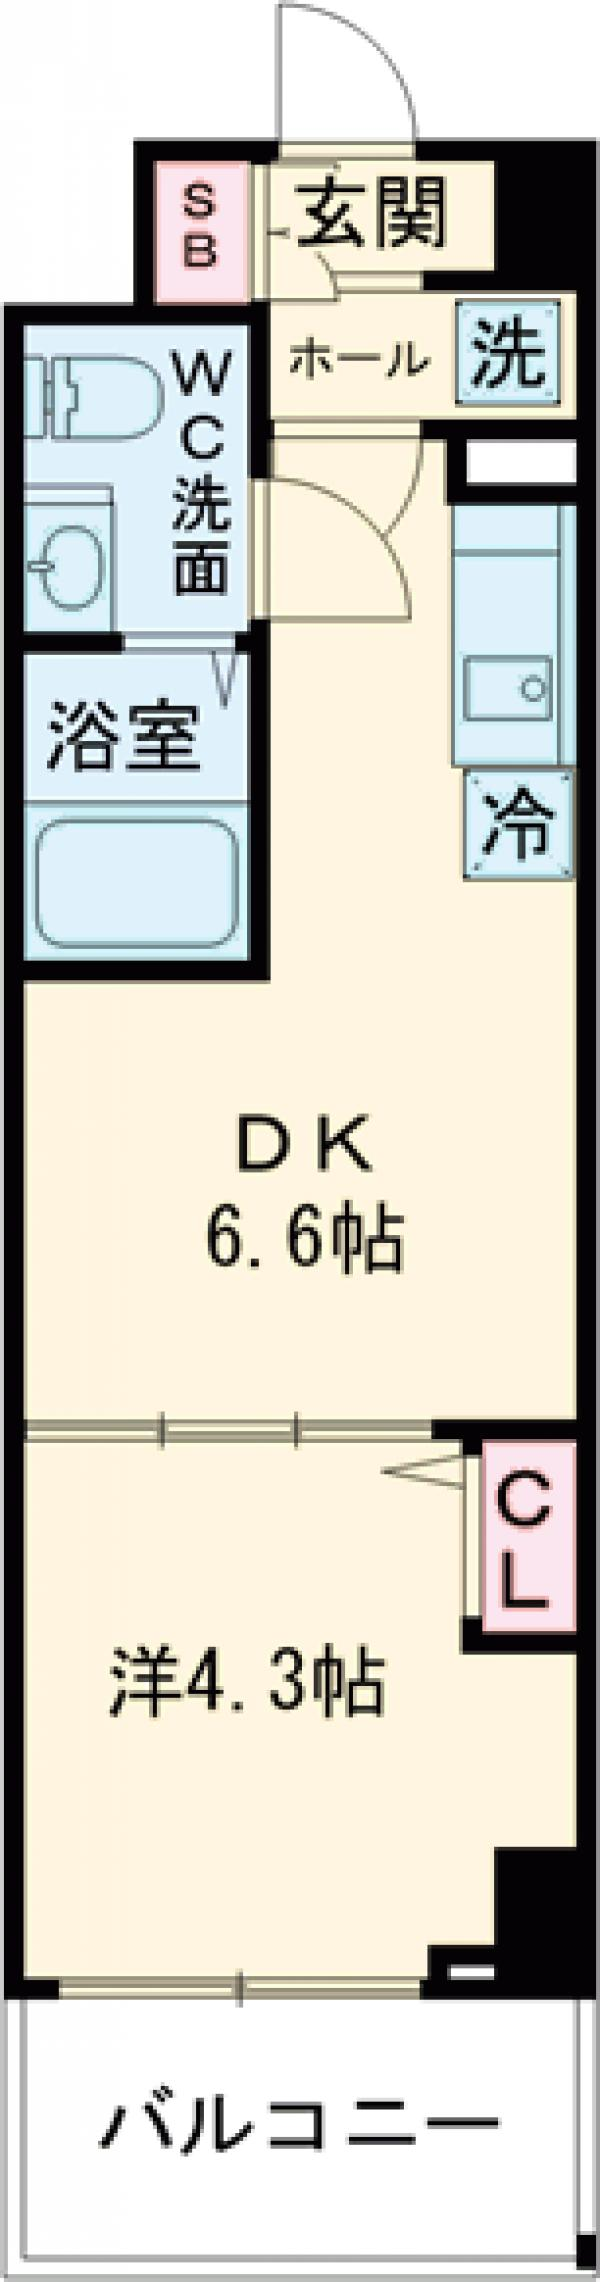 KDXレジデンス梅島・108号室の間取り